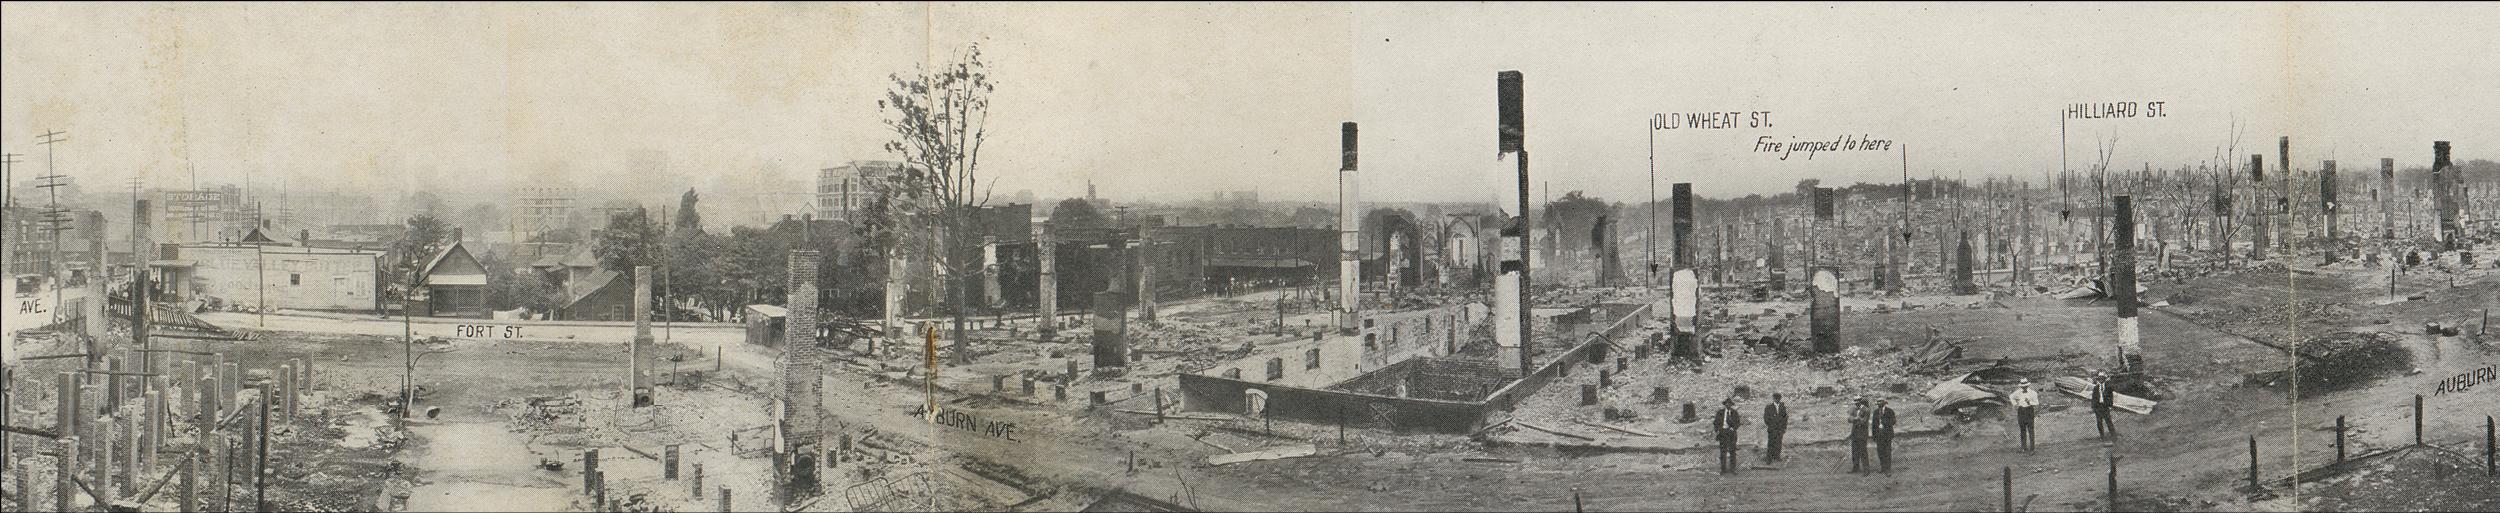 Great Fire of 1917 Atlanta